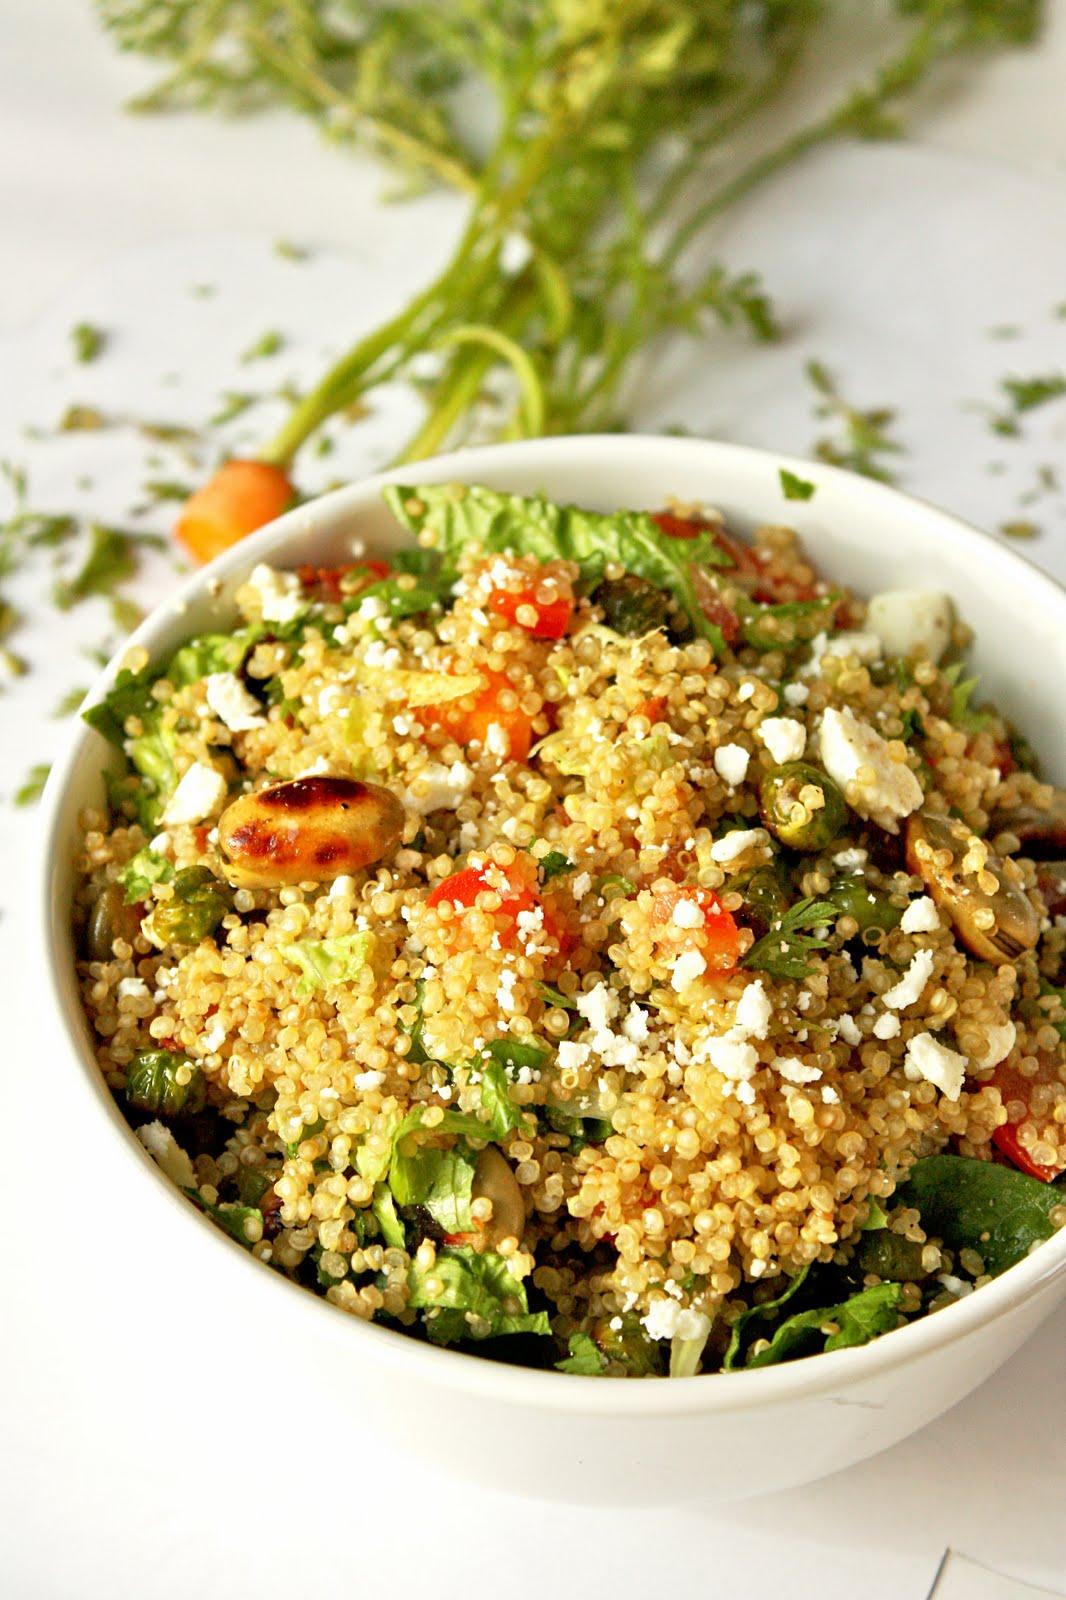 Sreelus Tasty Travels: Quinoa Salad loaded with Fava beans, fresh peas ...